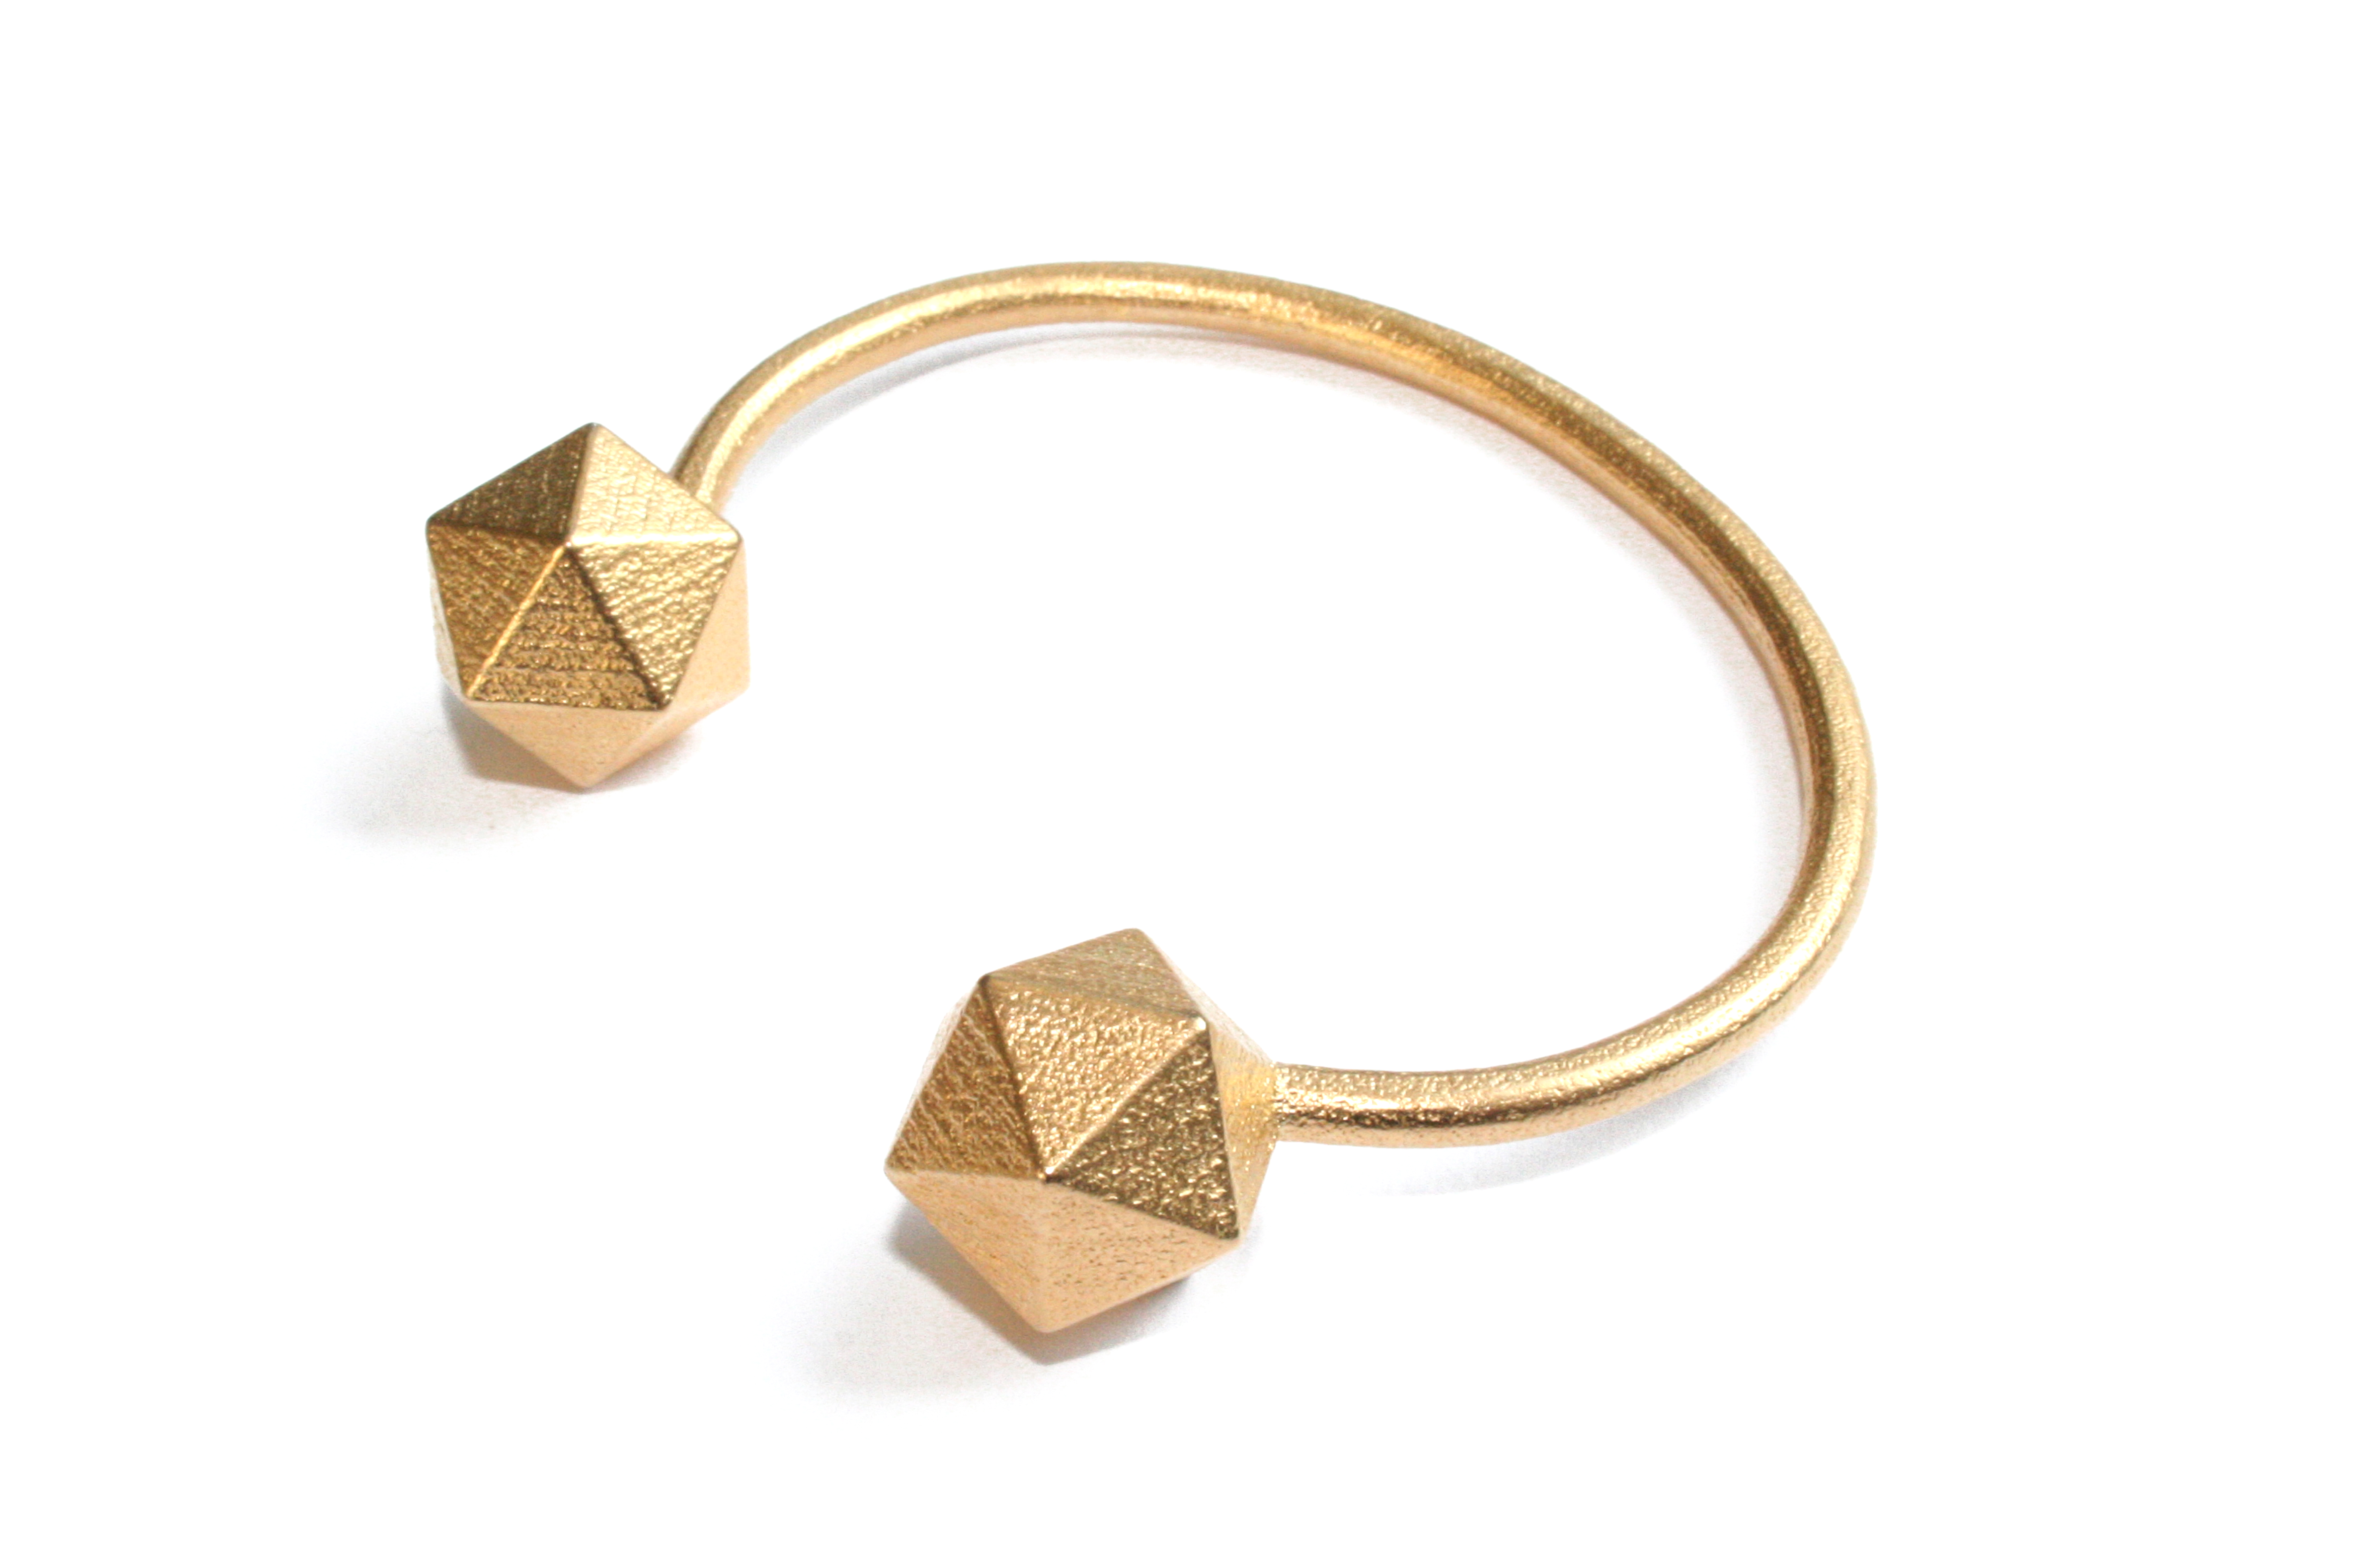 216846 geom gold bracelet daniellevroemen bfe126 original 1467882113